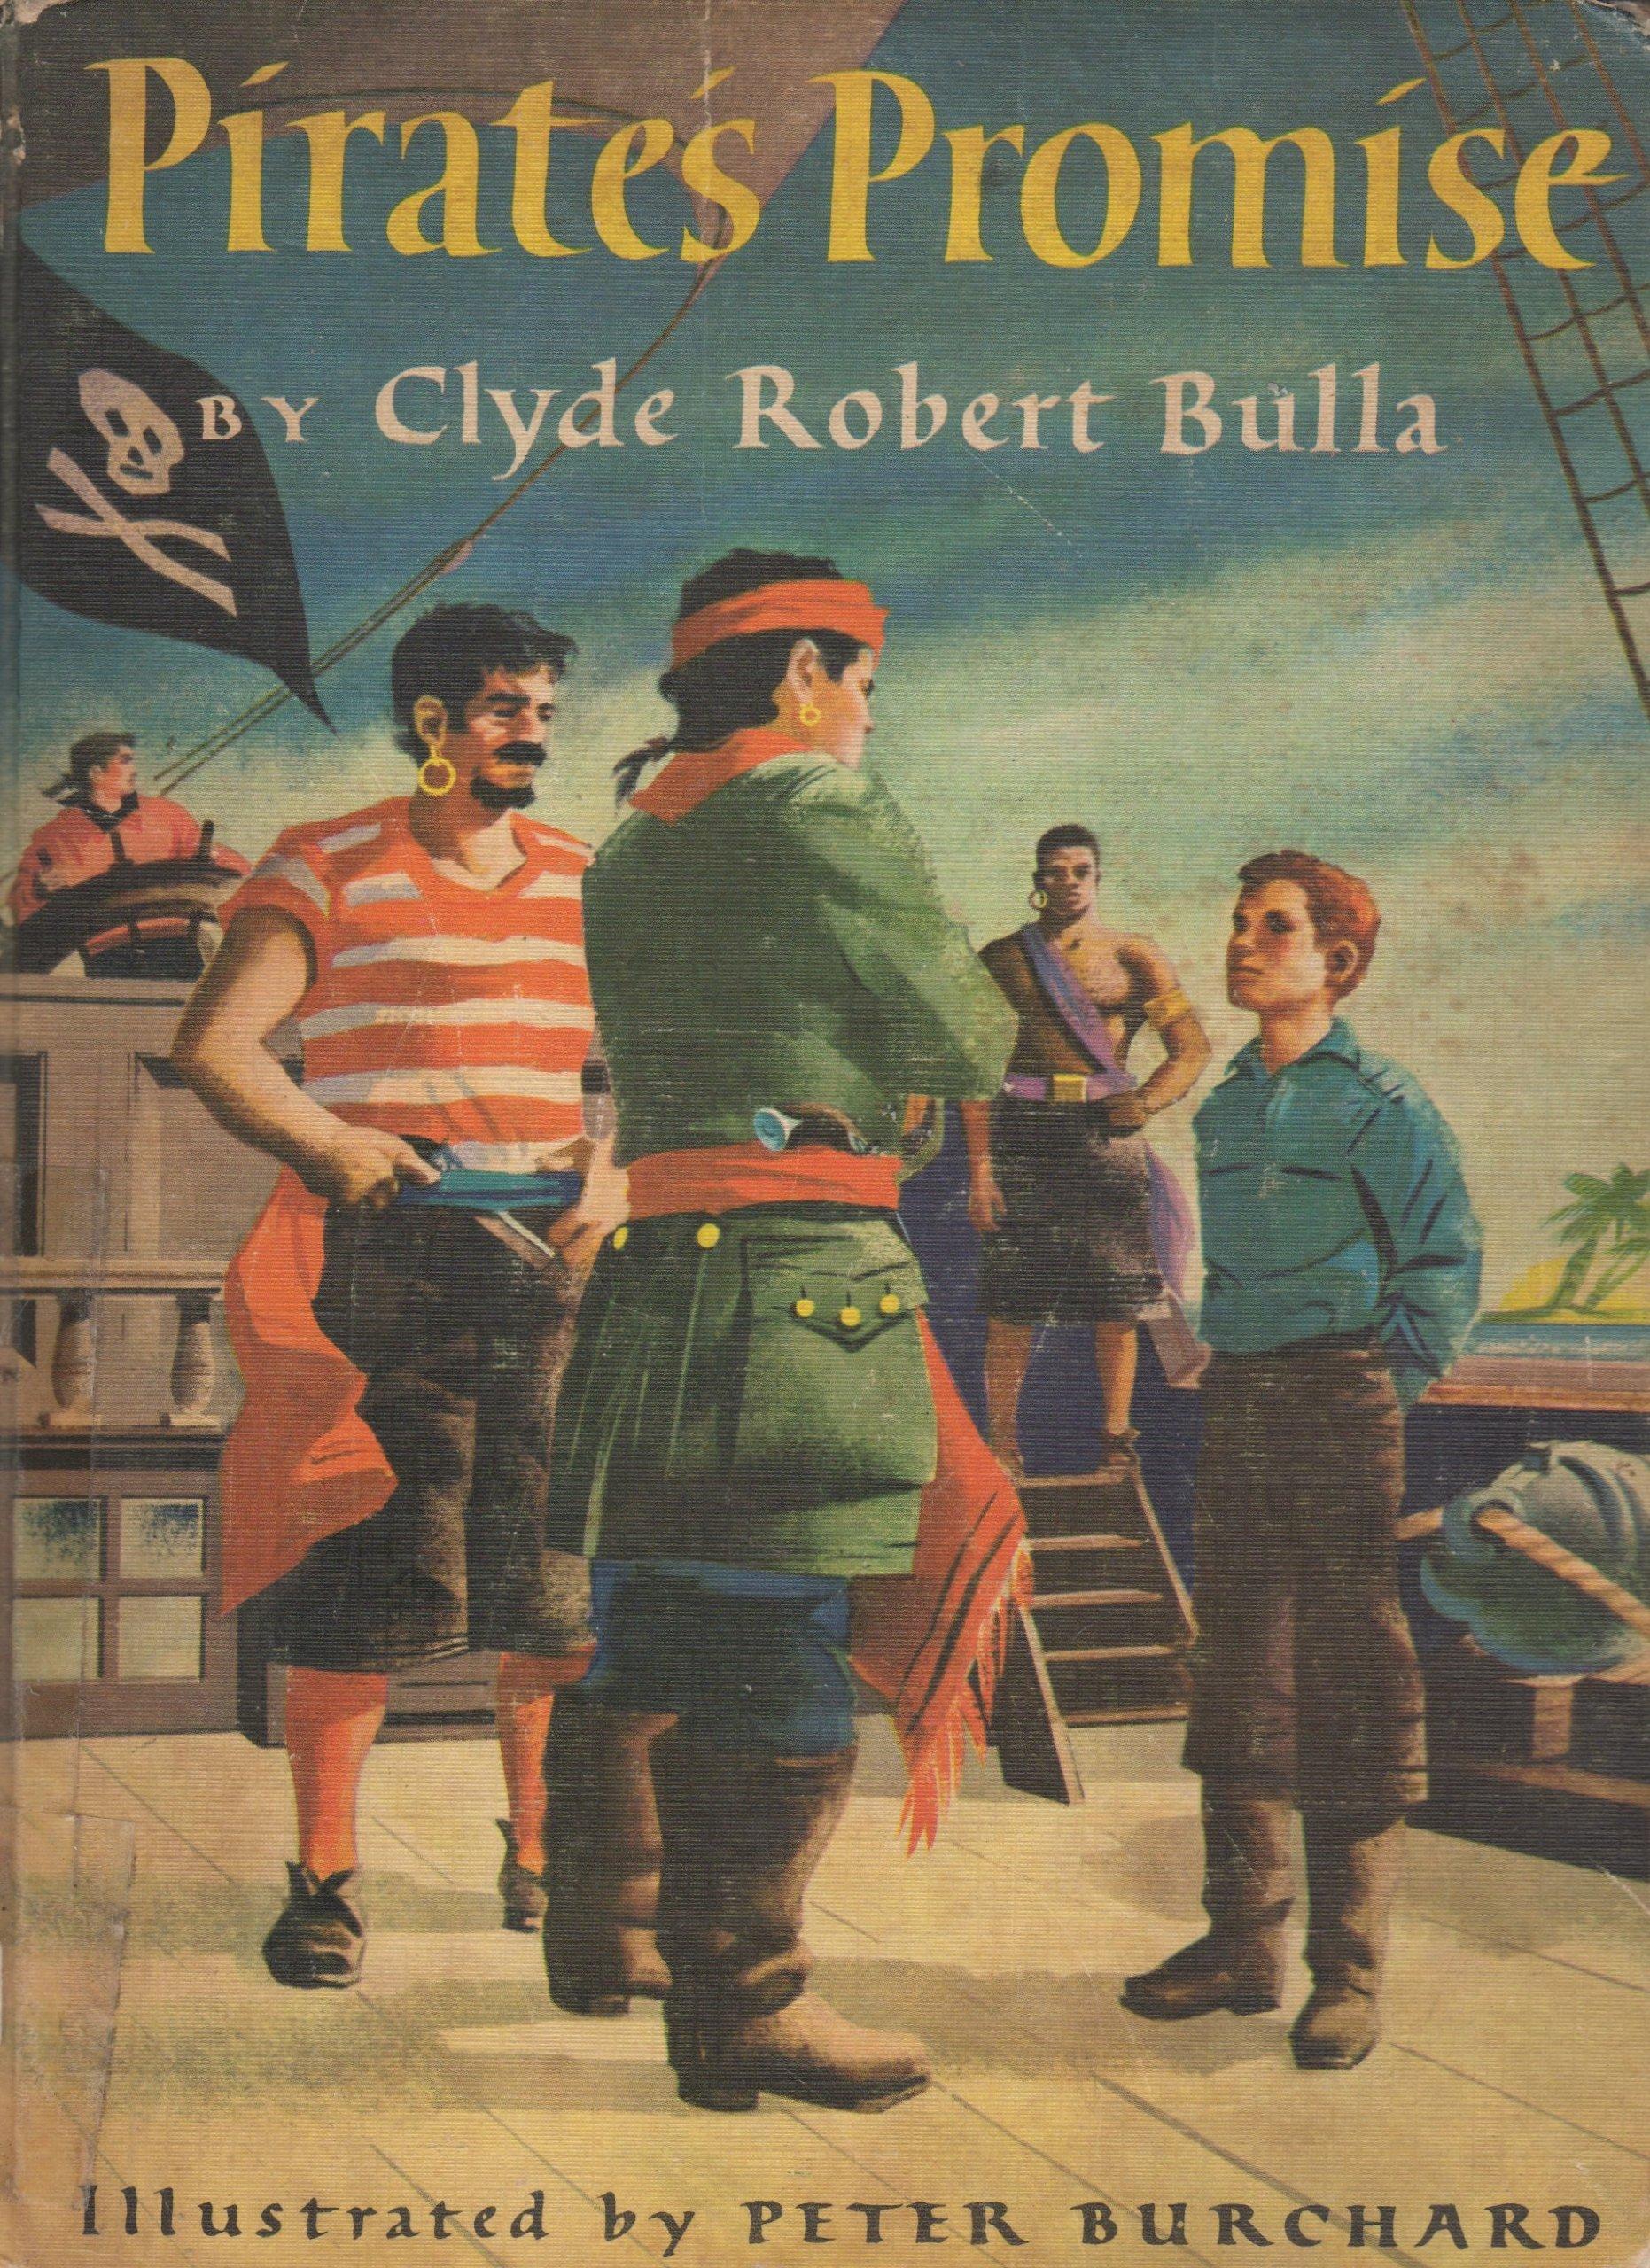 Pirate's promise, Bulla, Clyde Robert